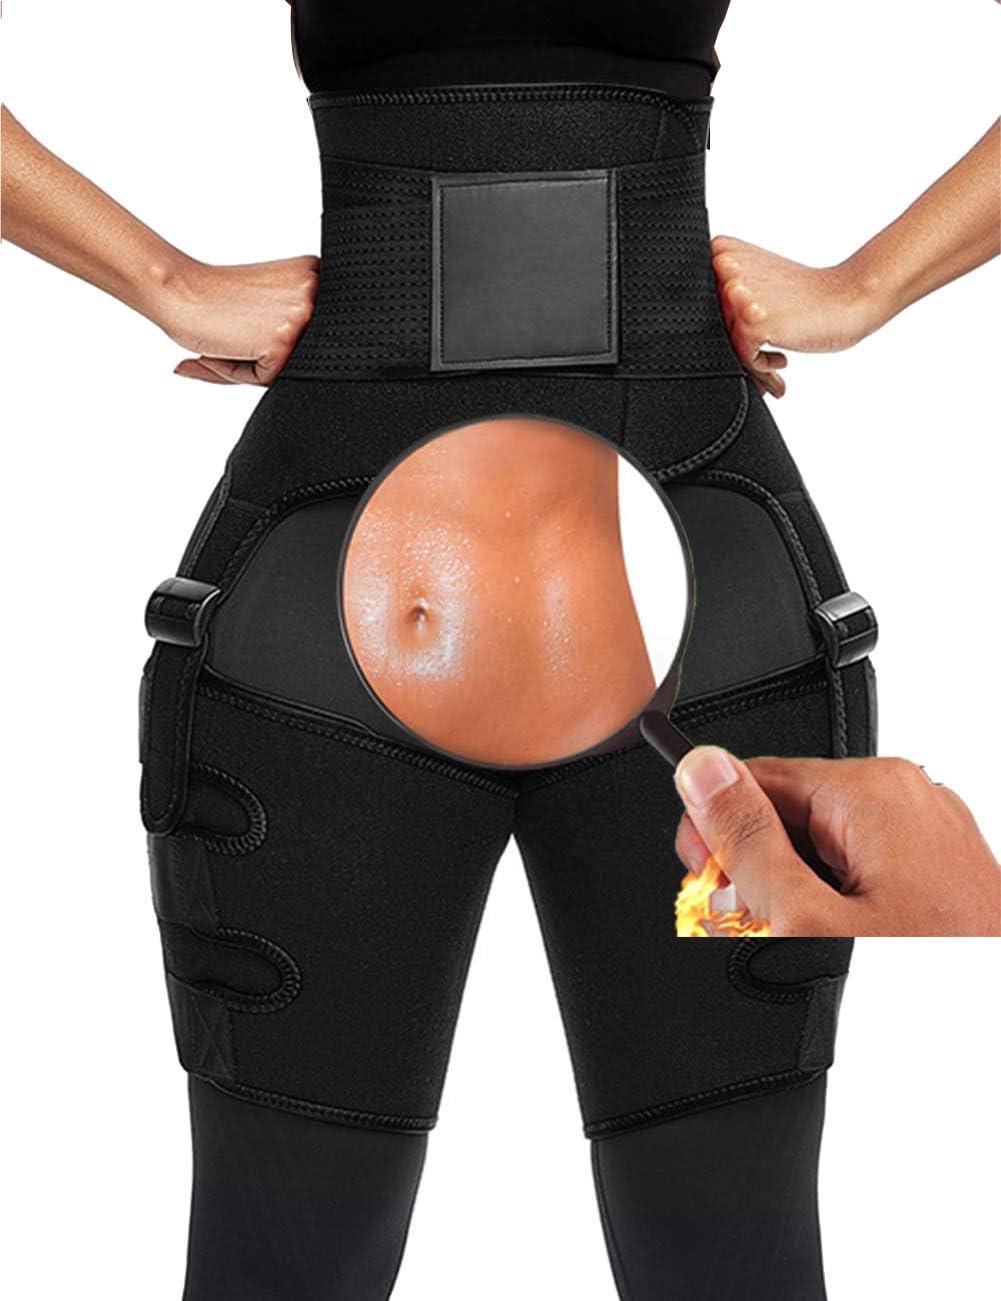 ODOBOU 3-in-1 Waist Trainer for Women, Butt Lifter and Hip Enhancer, Thigh Trimmers Eraser Shapeware Booty Belt: Sports & Outdoors